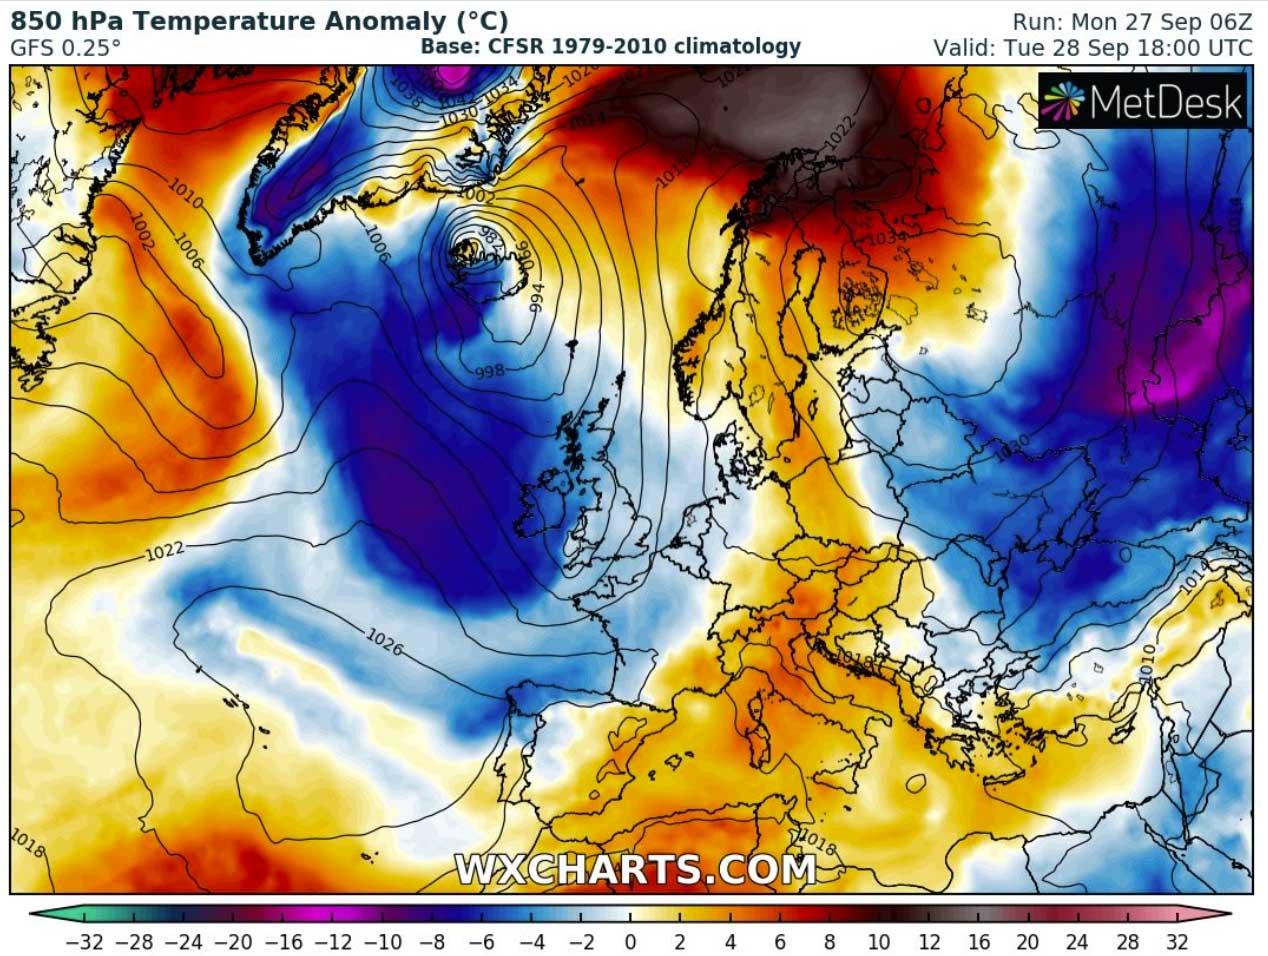 north-atlantic-cold-pool-uk-ireland-snow-iceland-temperature-tuesday